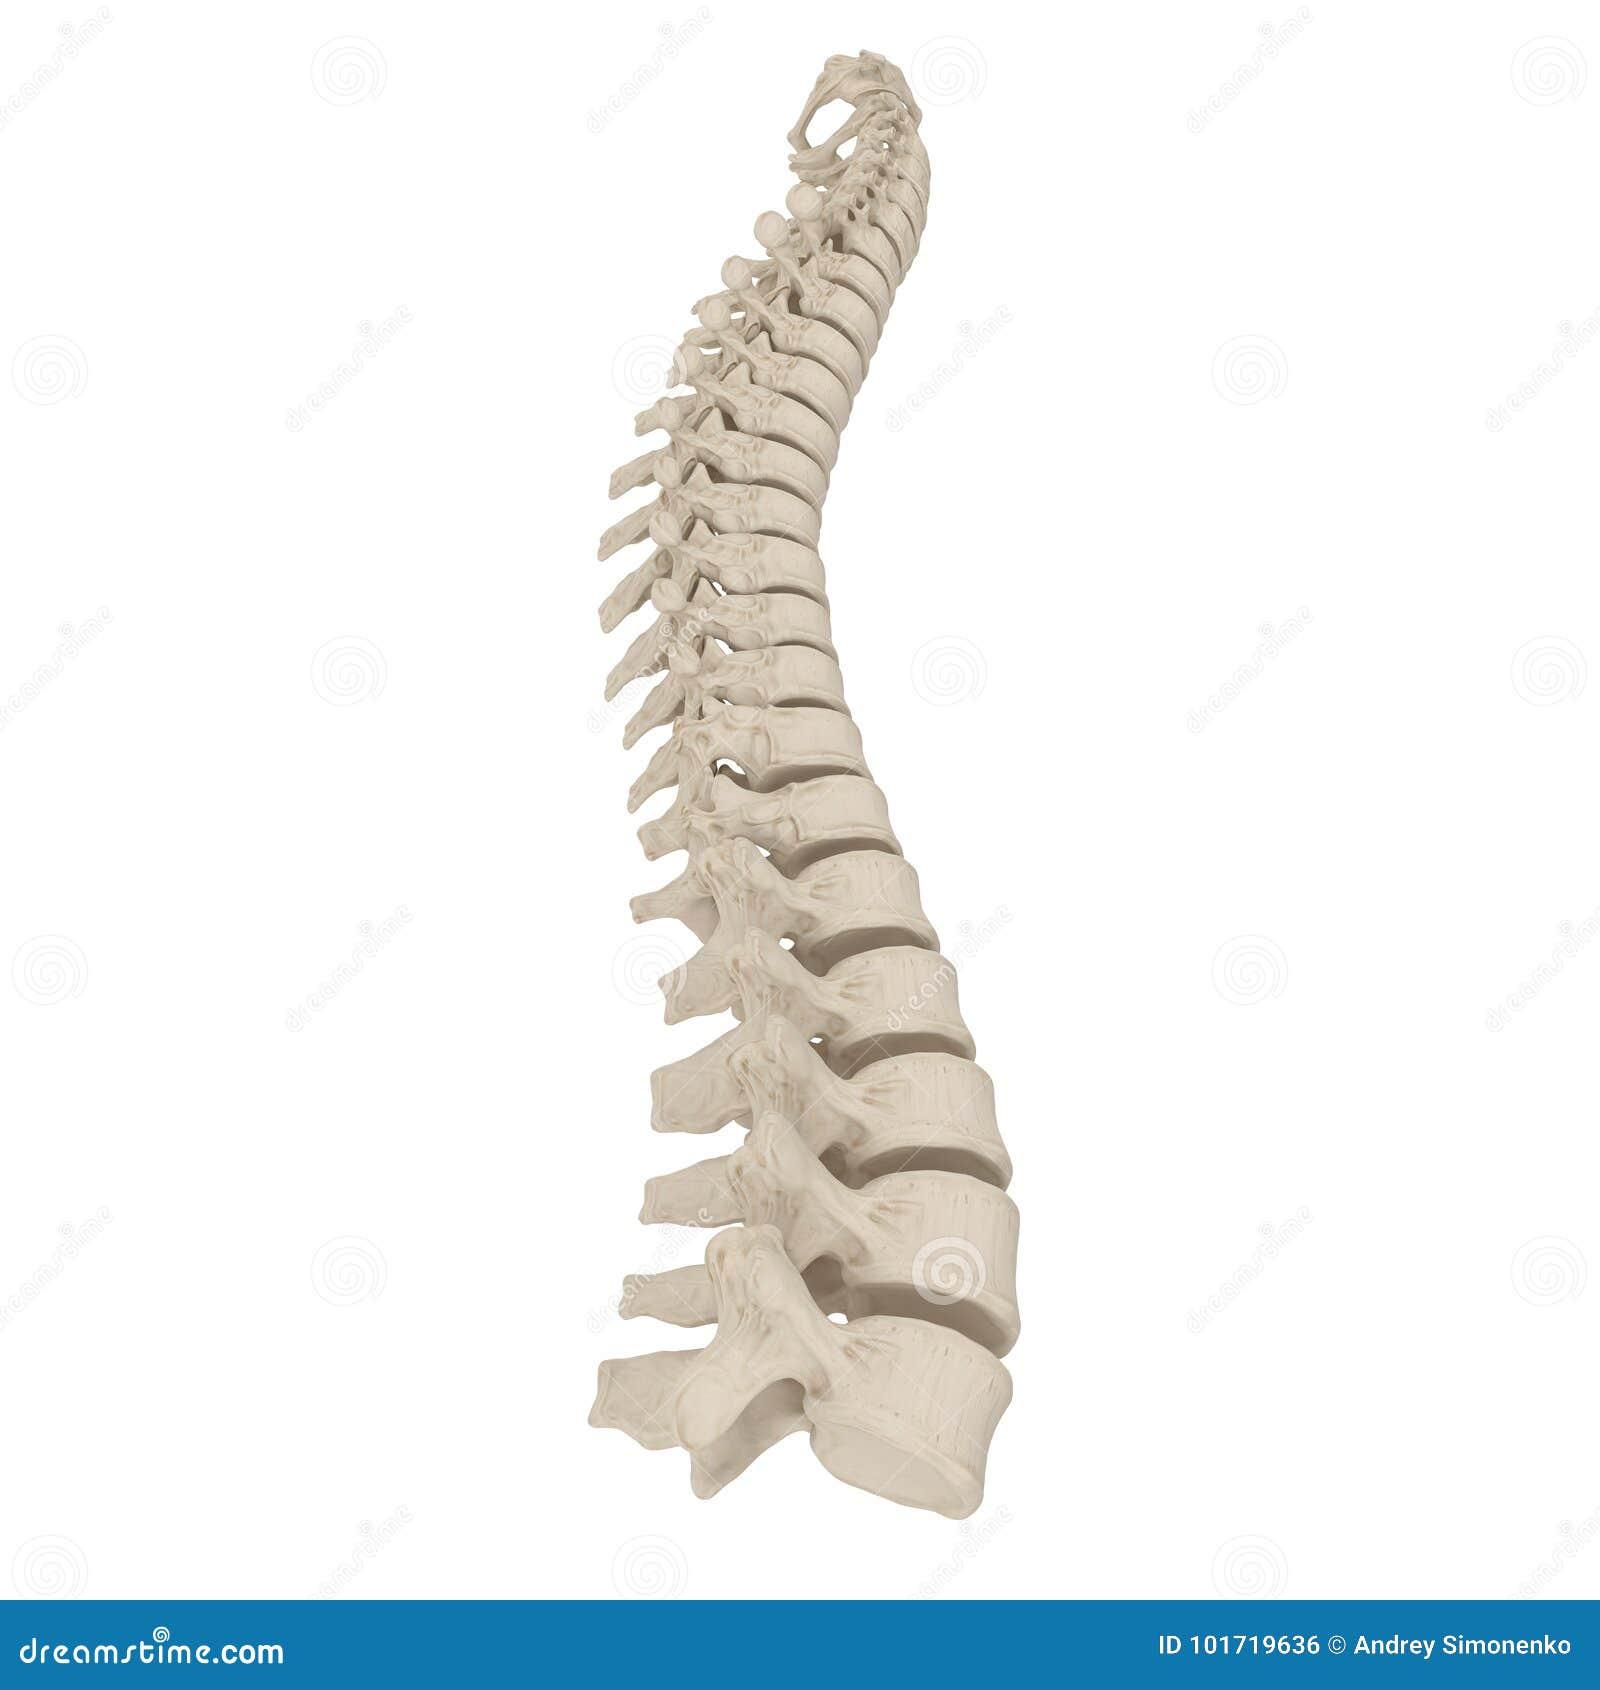 Anatomía Humana De La Espina Dorsal Lumbar En Blanco Ilustración 3D ...